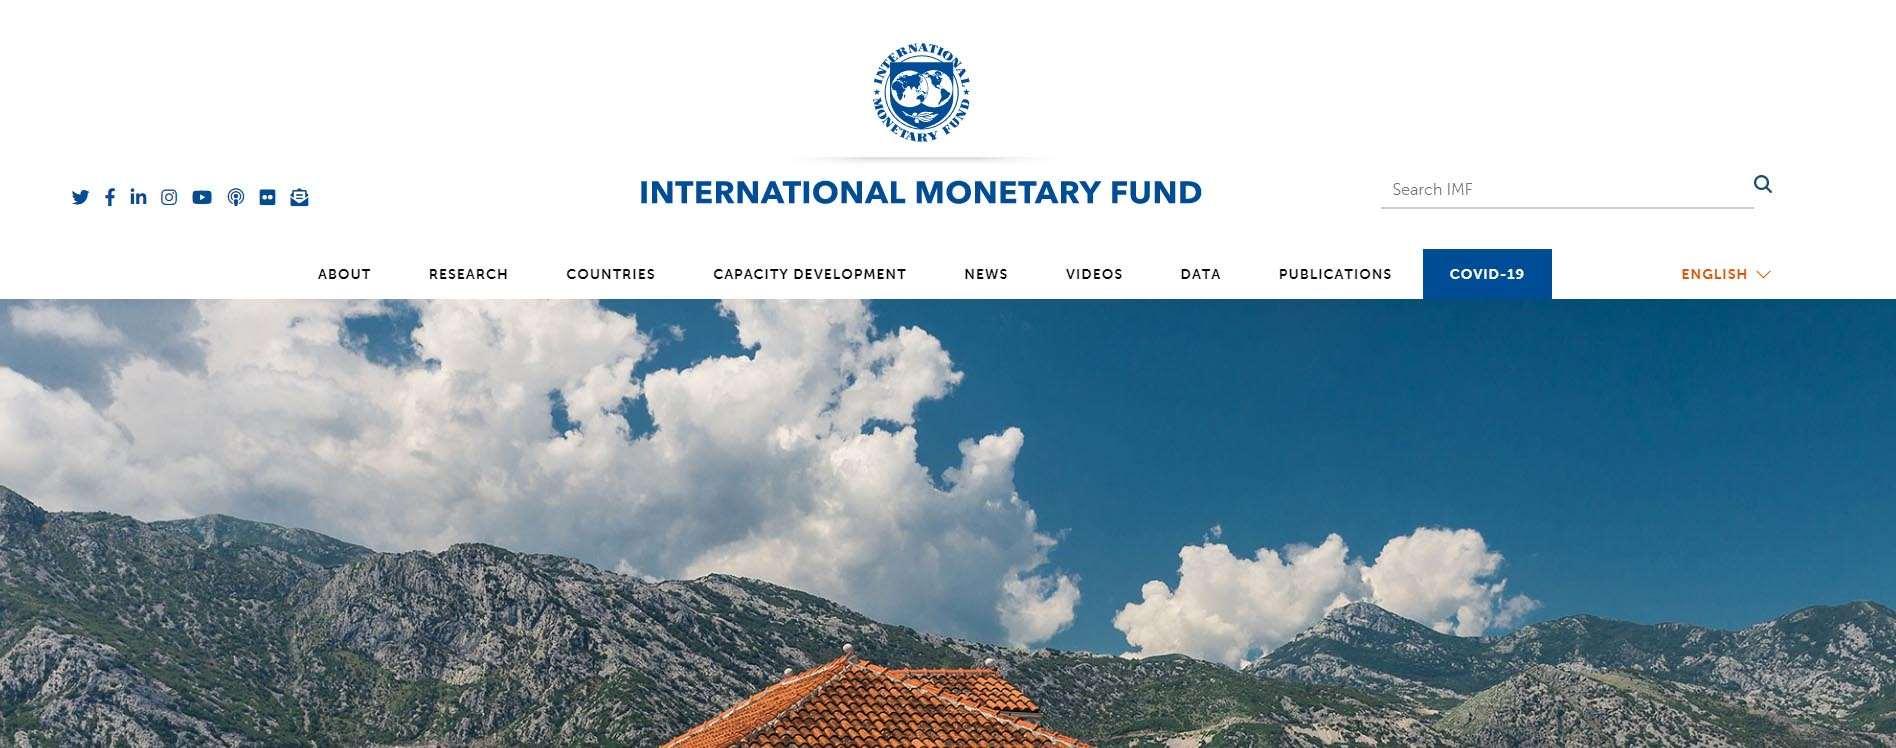 International Monetary Fond